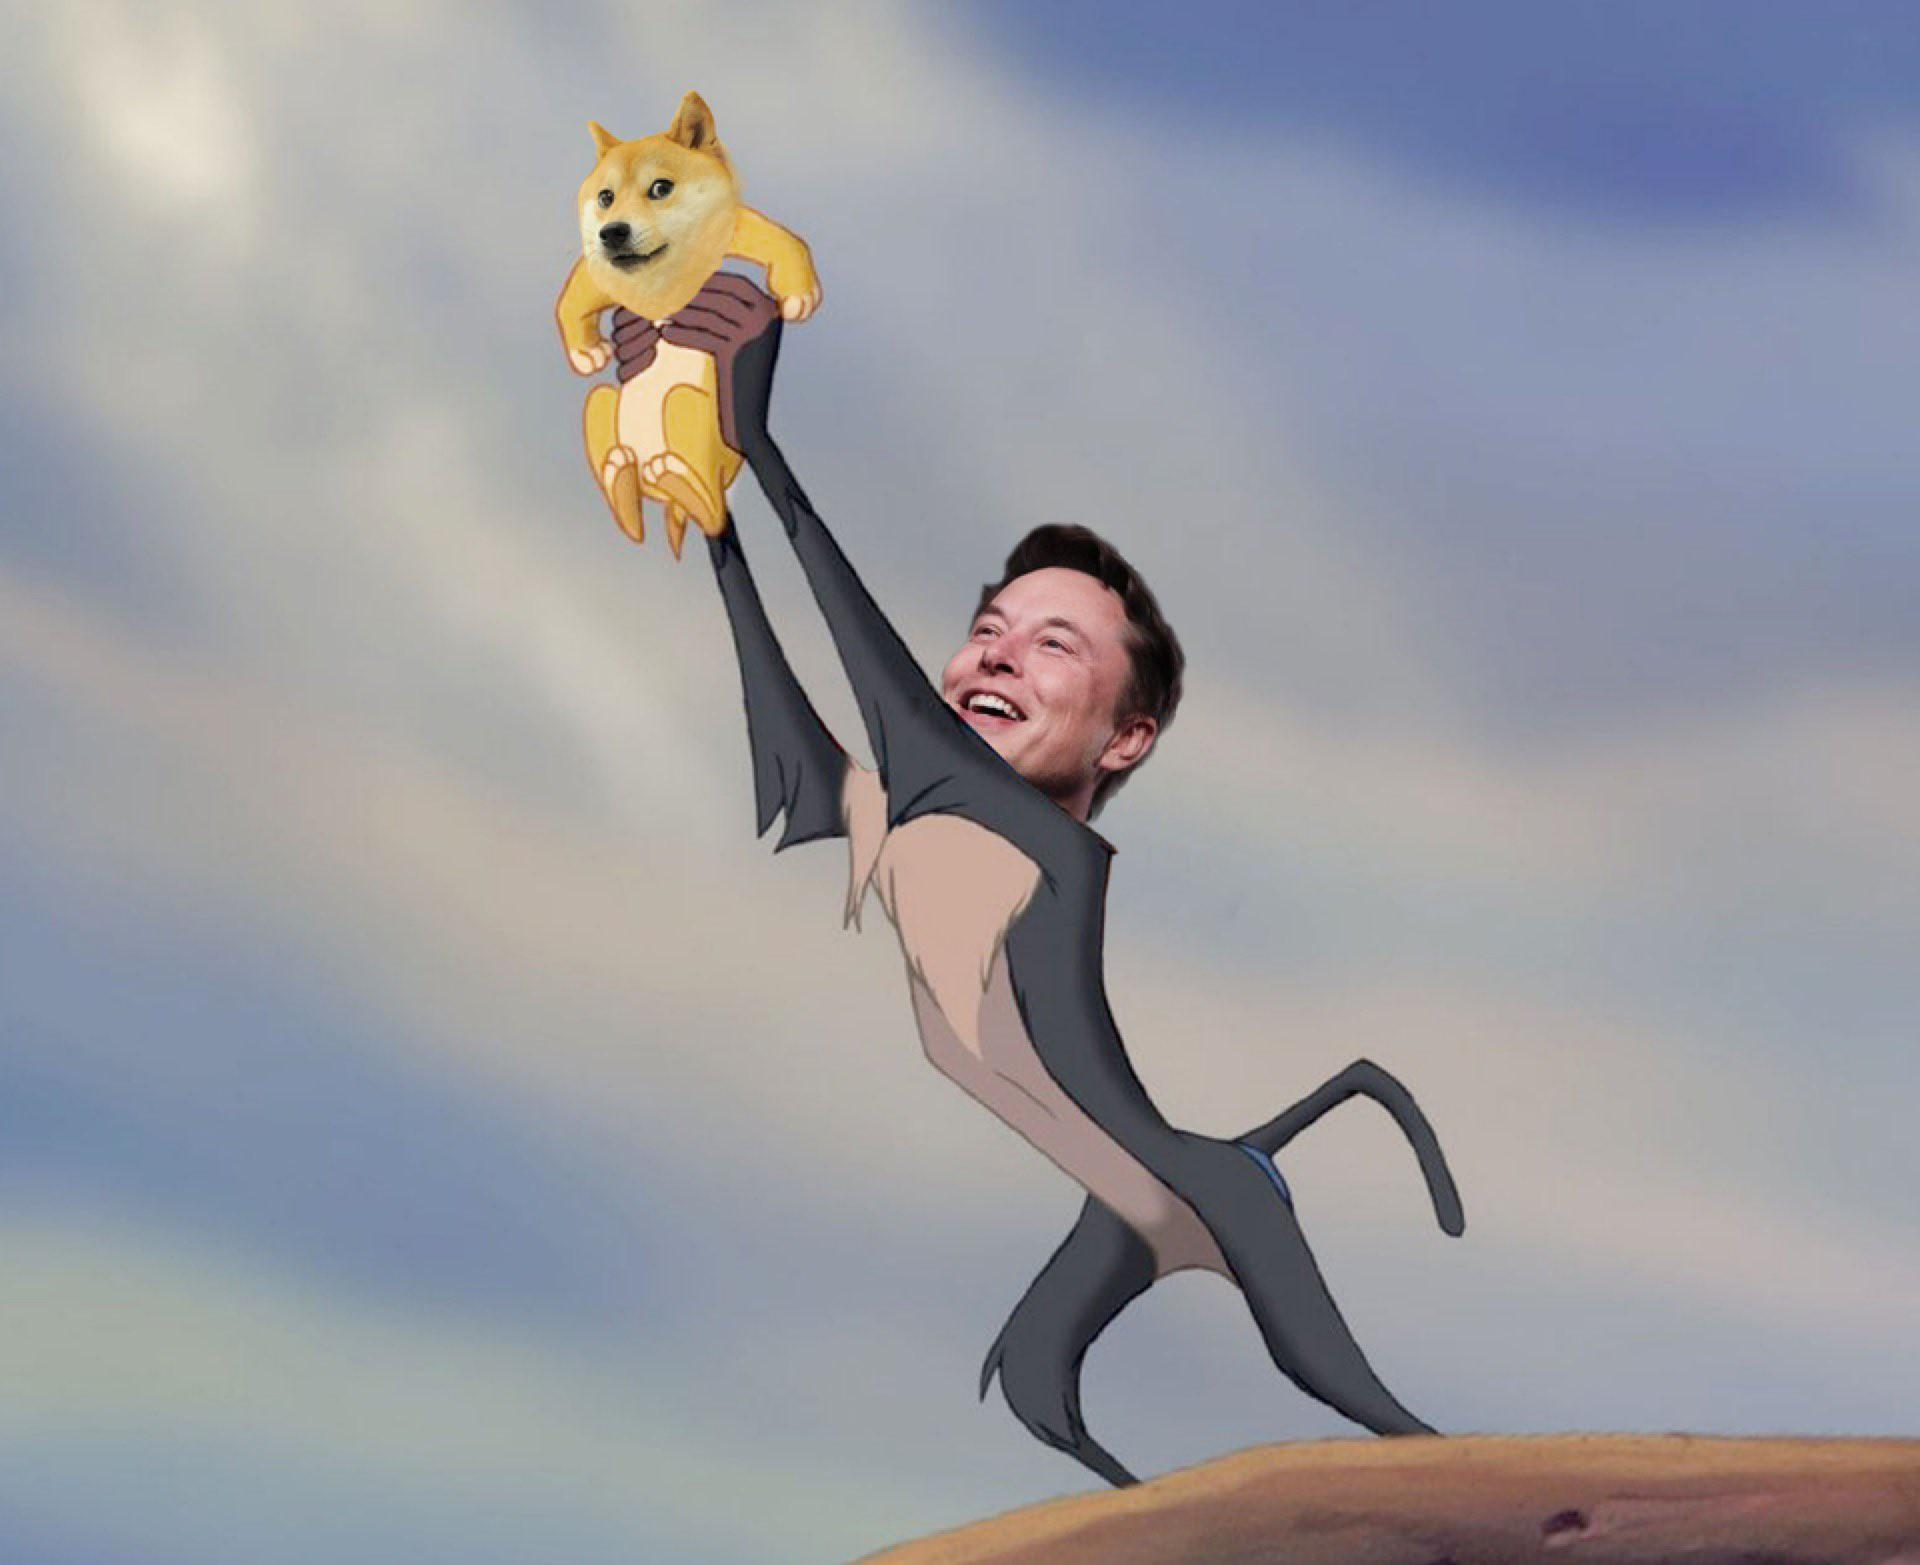 Elon Musk Lion King Dogecoin meme